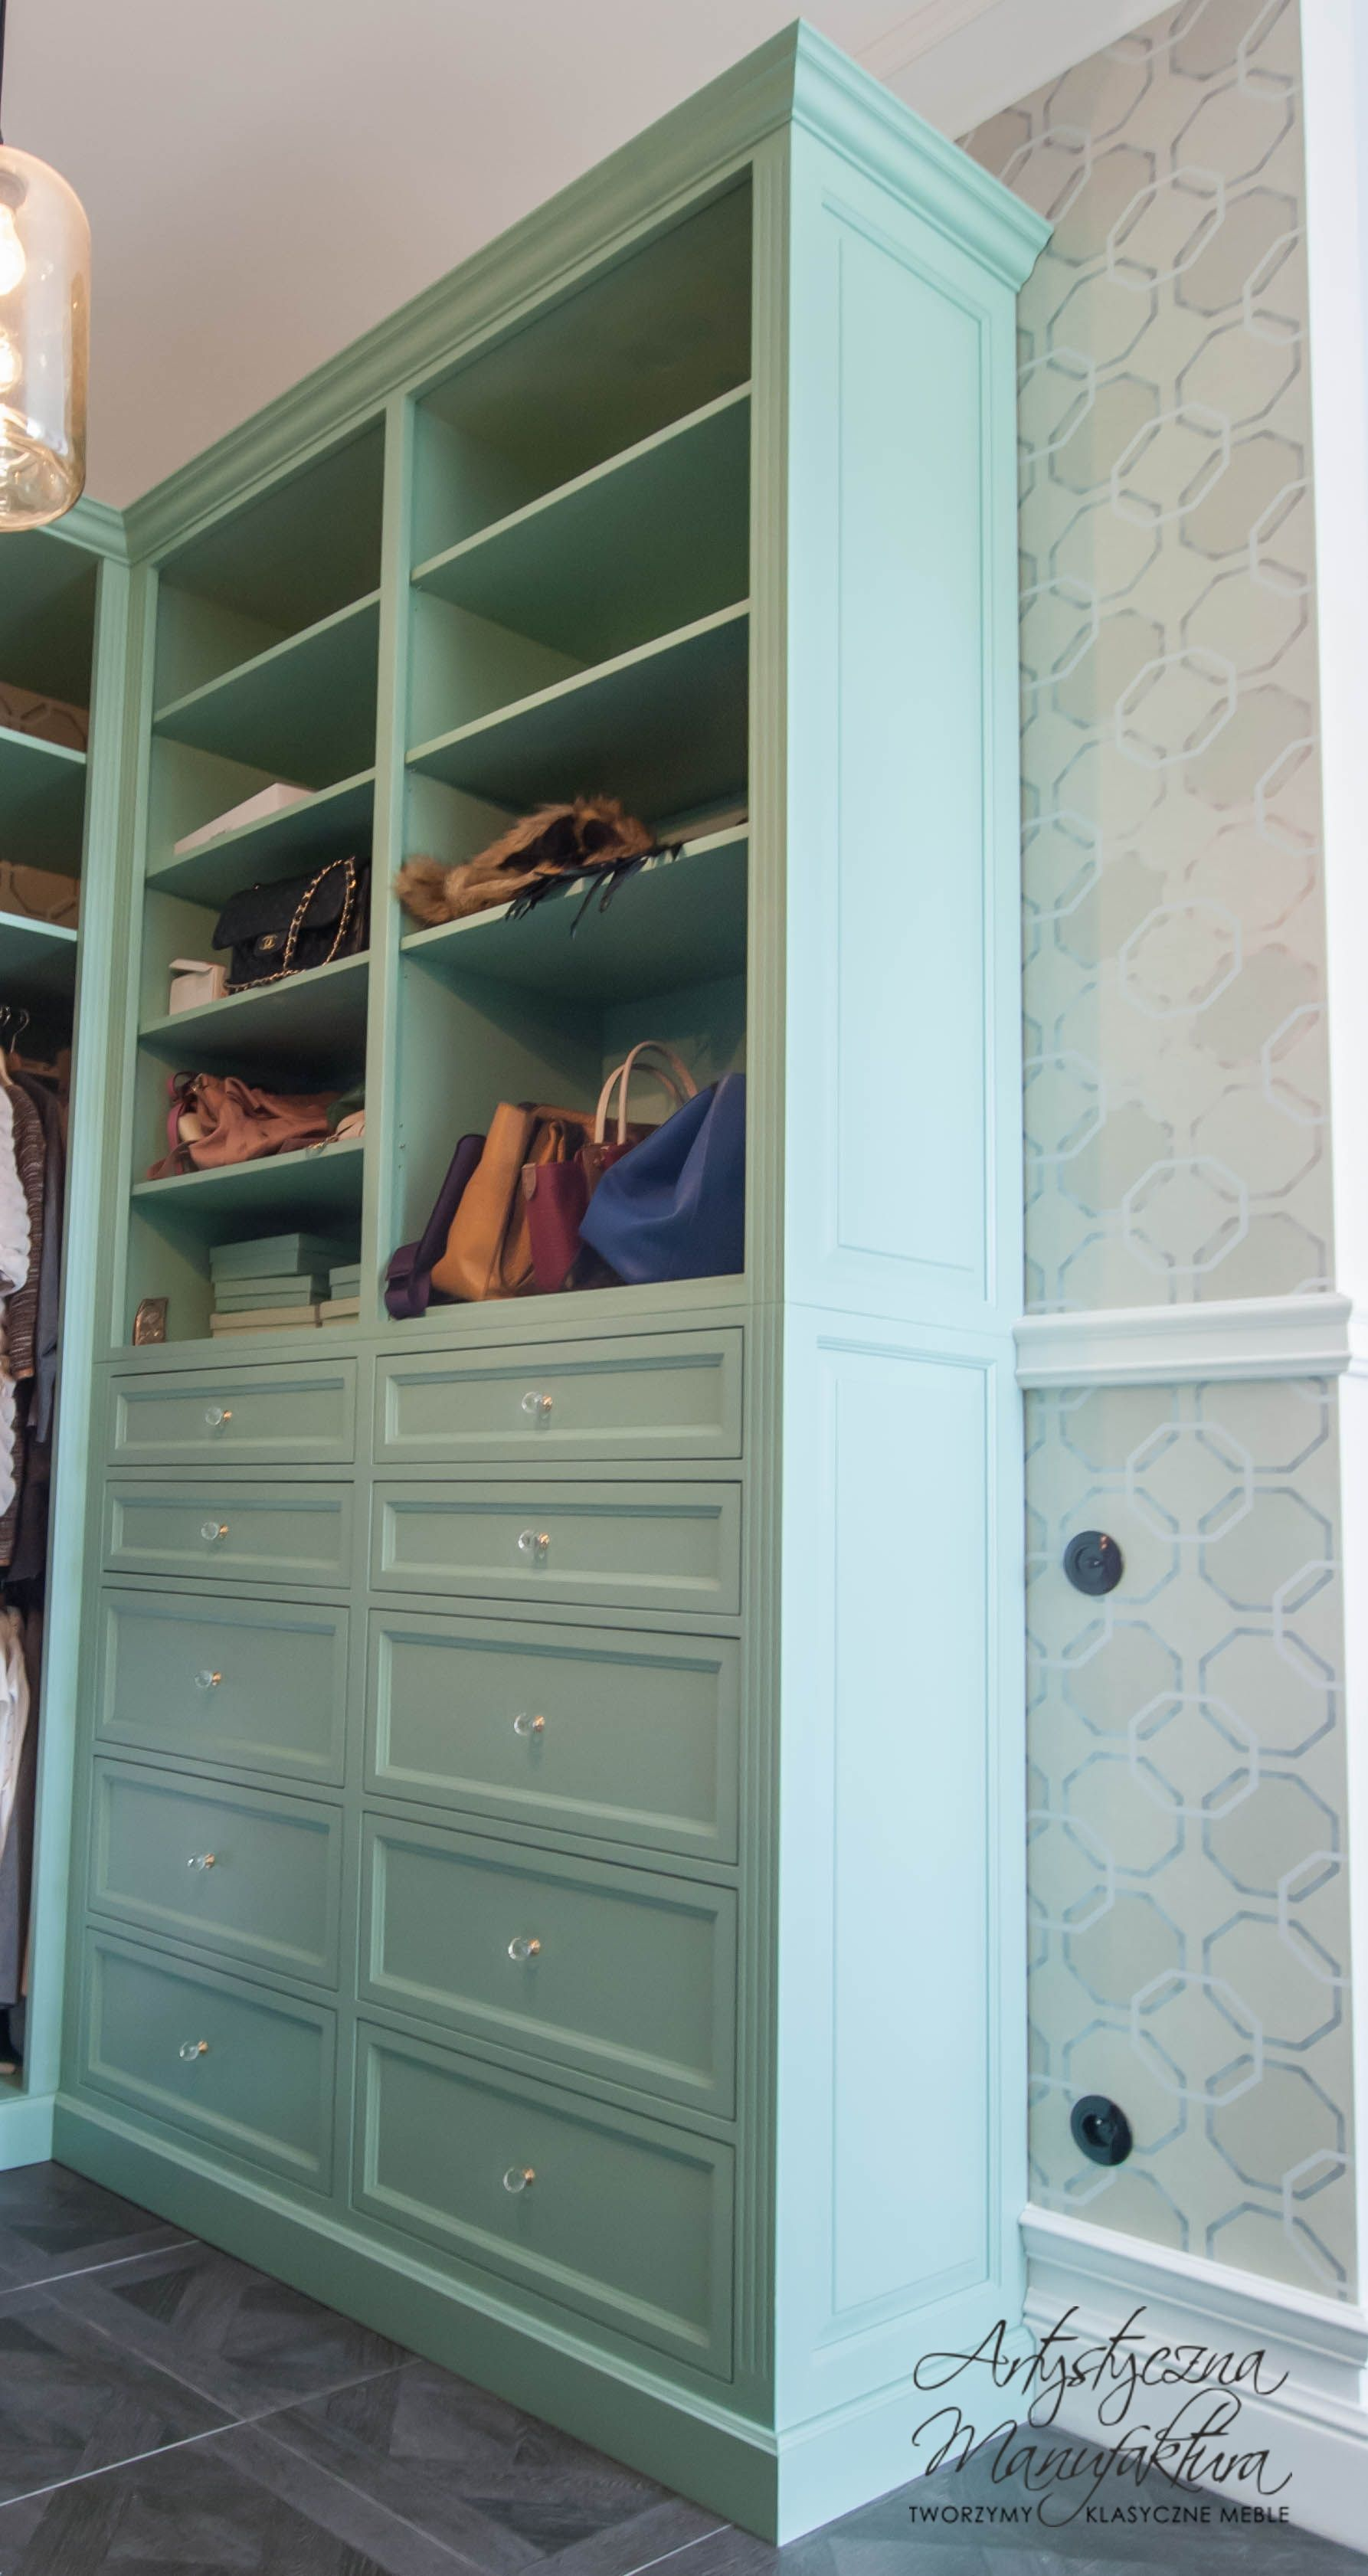 dressing closet closets arts habersham and decorative jl room cabinetry custom pin